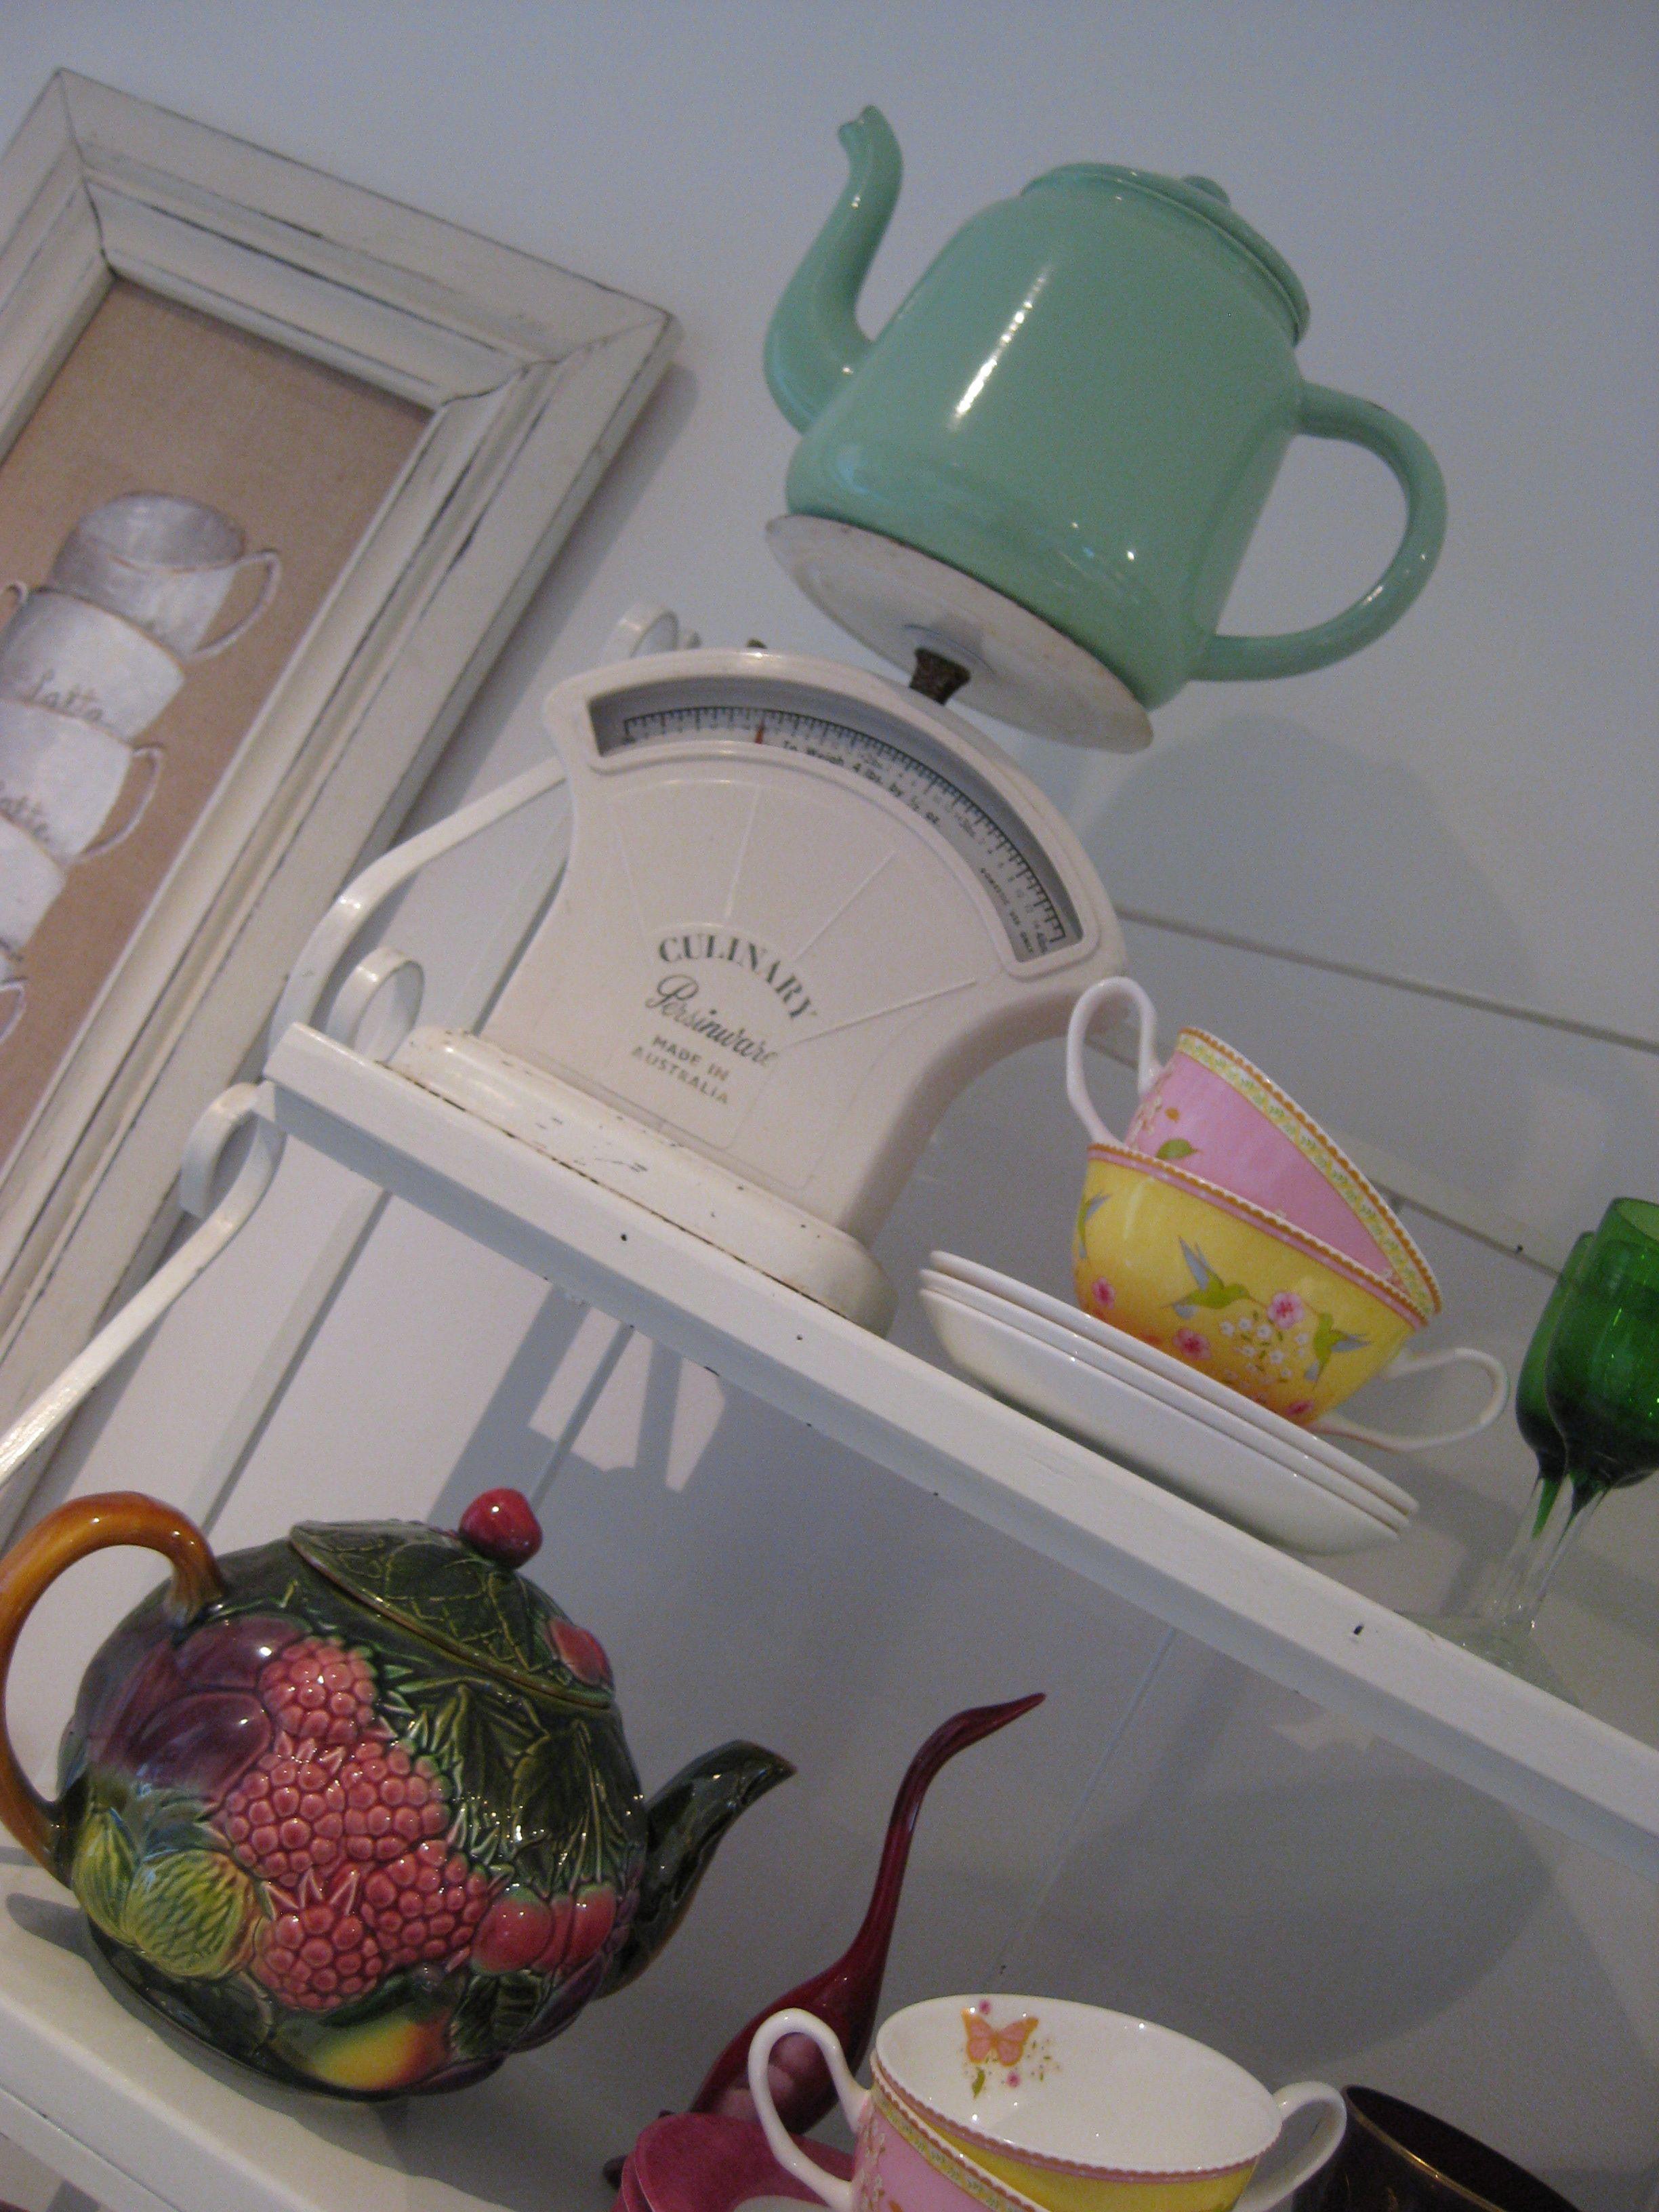 Little display of vintage scales in my kitchen vintage